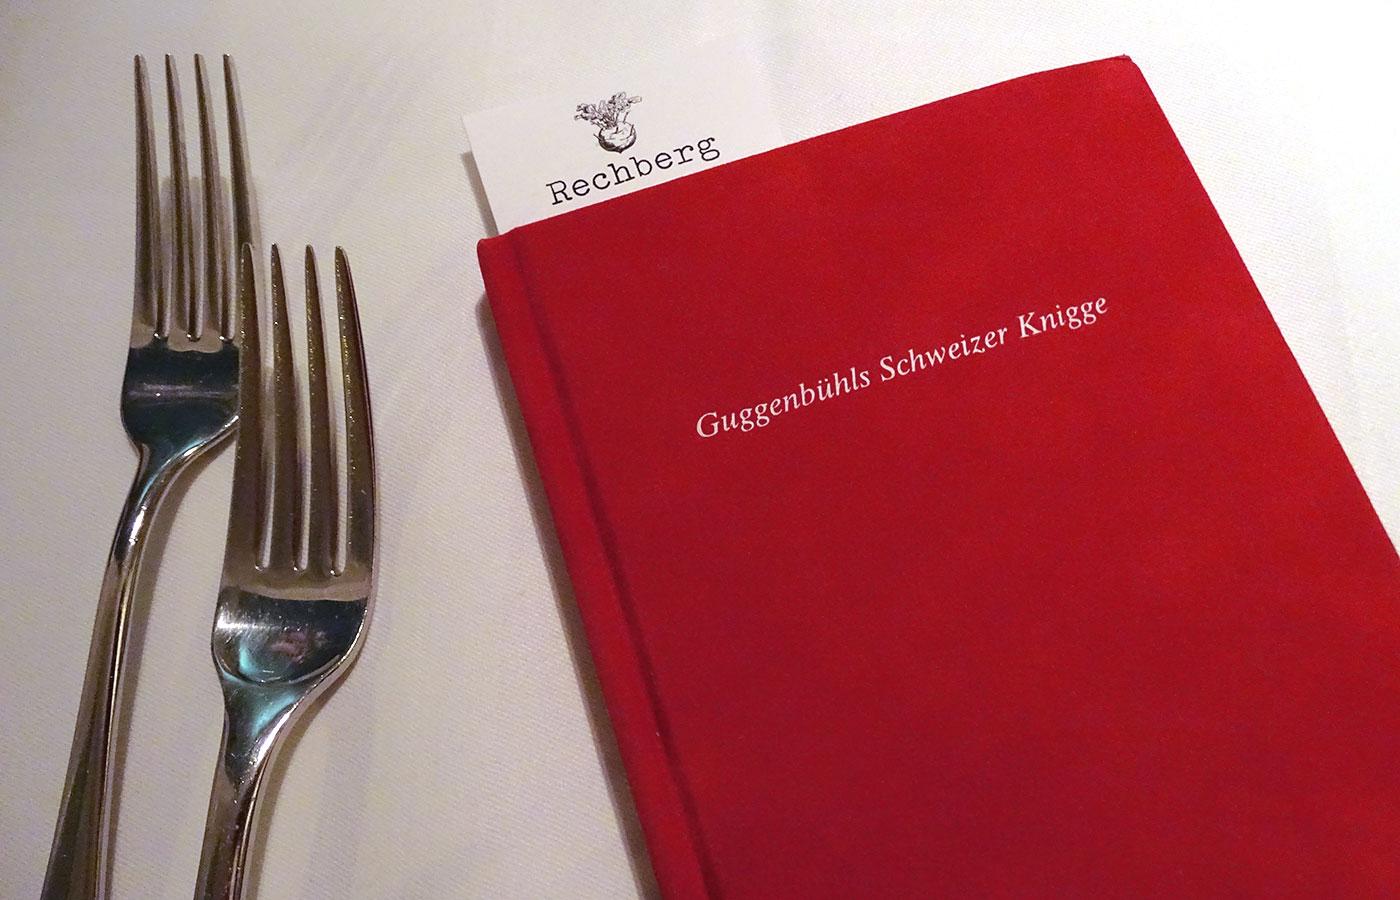 Restaurant Rechberg 1837 - Speisekarte im Knigge